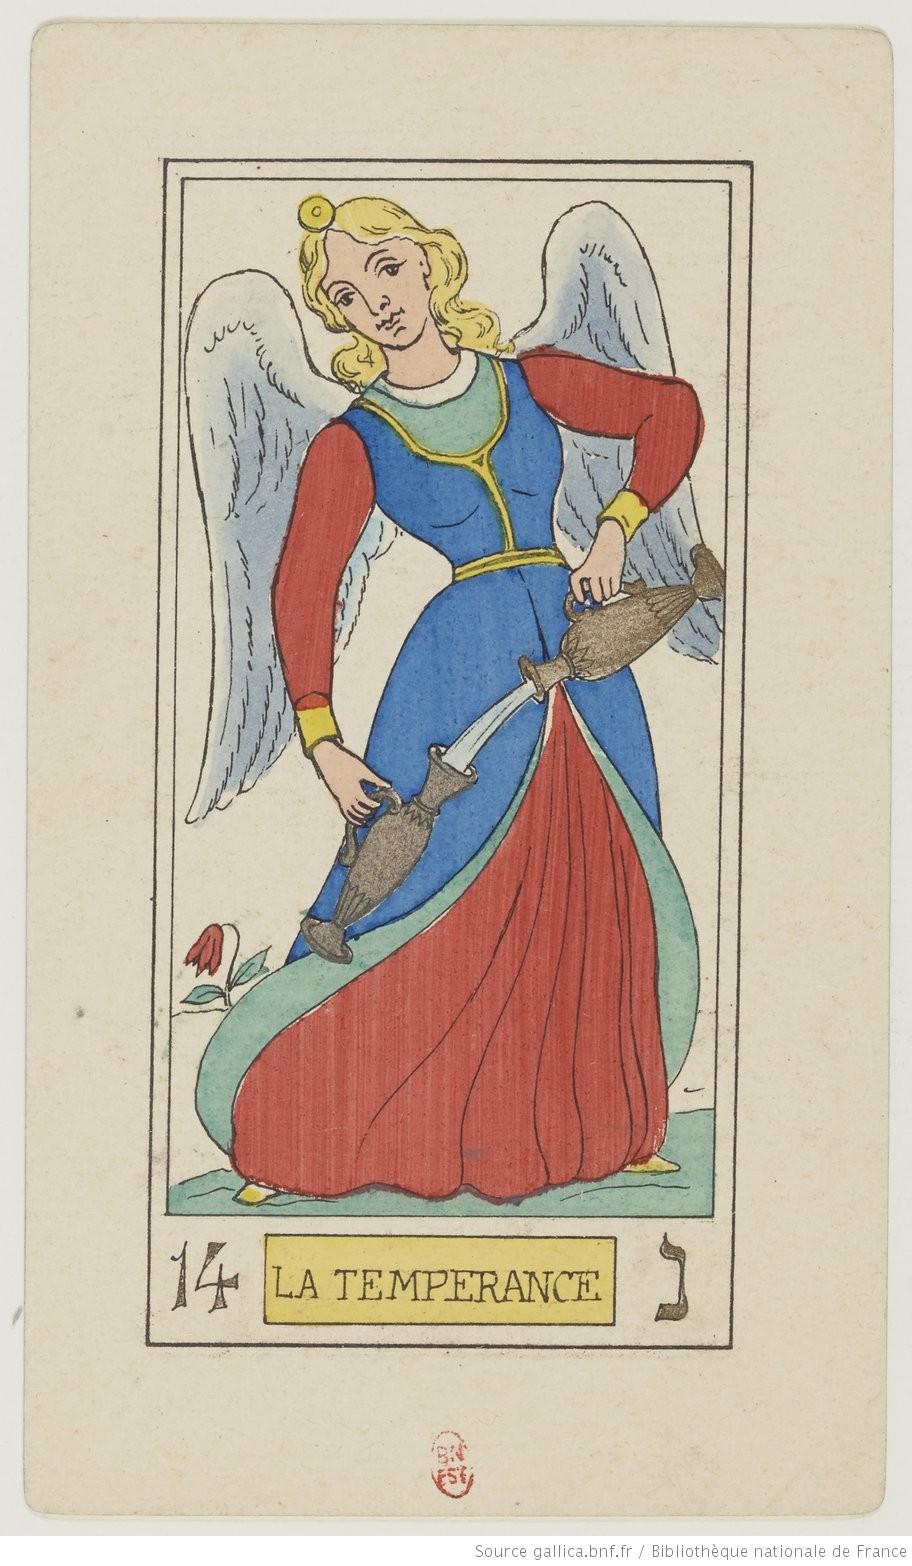 http://gallica.bnf.fr/ark:/12148/btv1b105110785/f11.highres